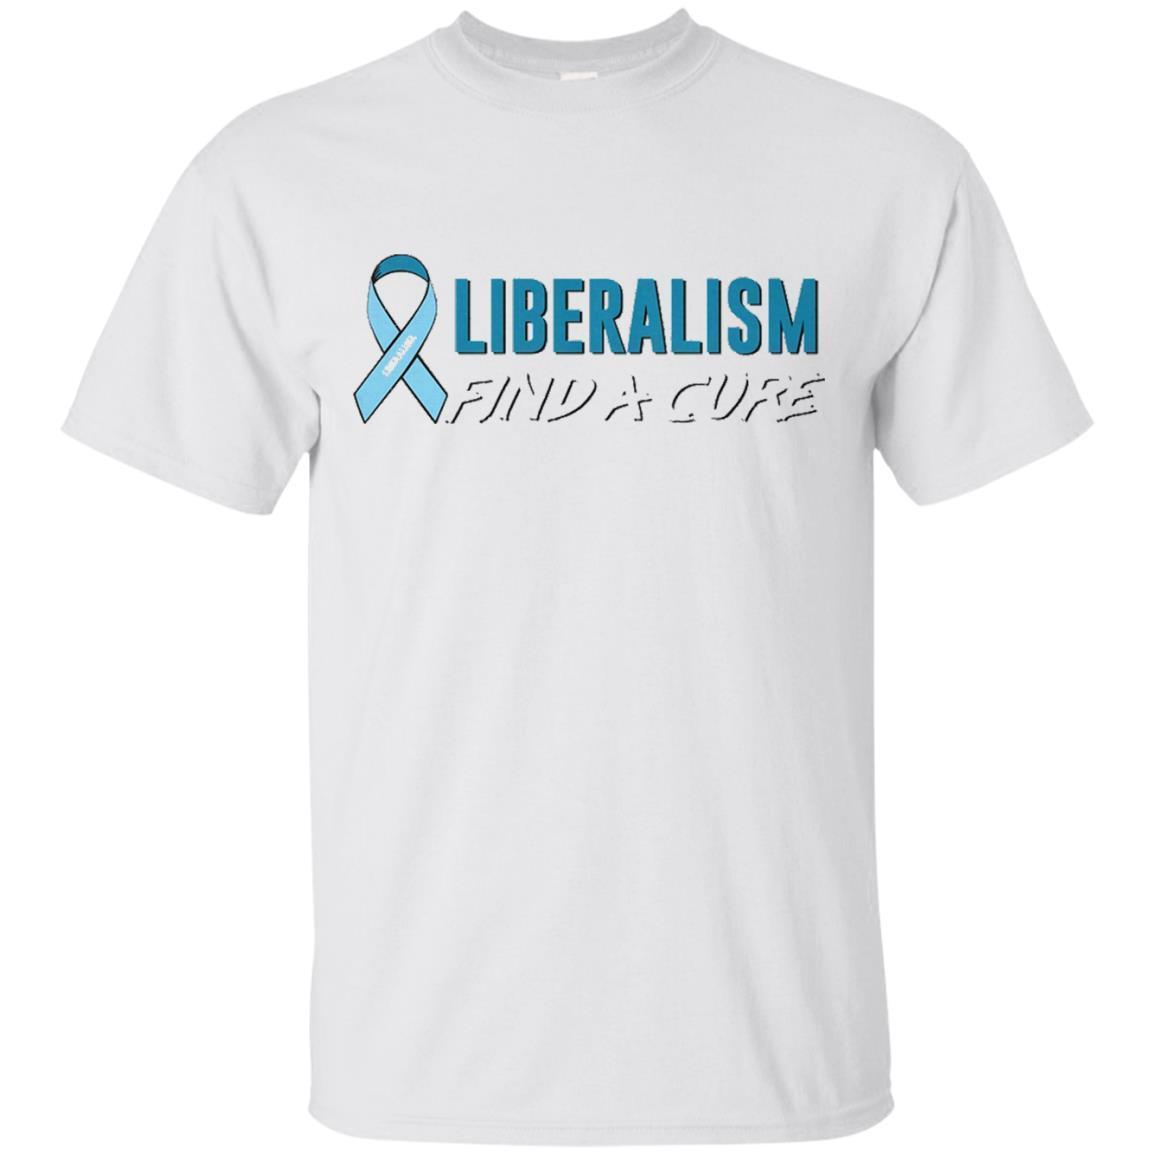 Liberalism Find a Cure Tshirt – T-Shirt